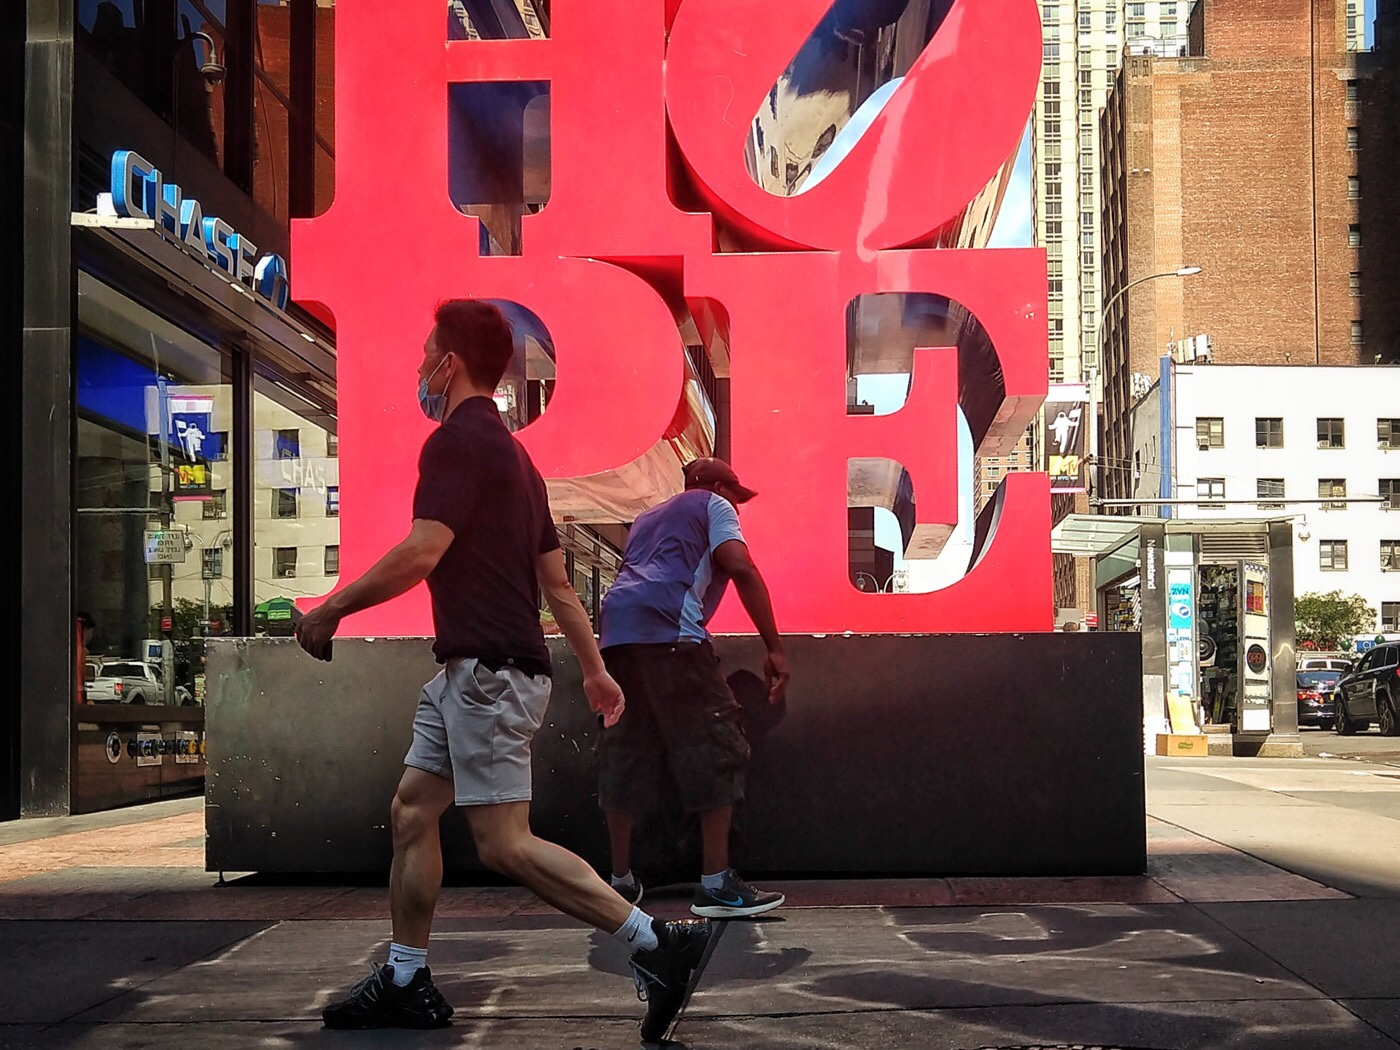 New York, Midtown Manhattan, 7th Avenue and 53rd Street, Robert Indiana Hope Sculpture